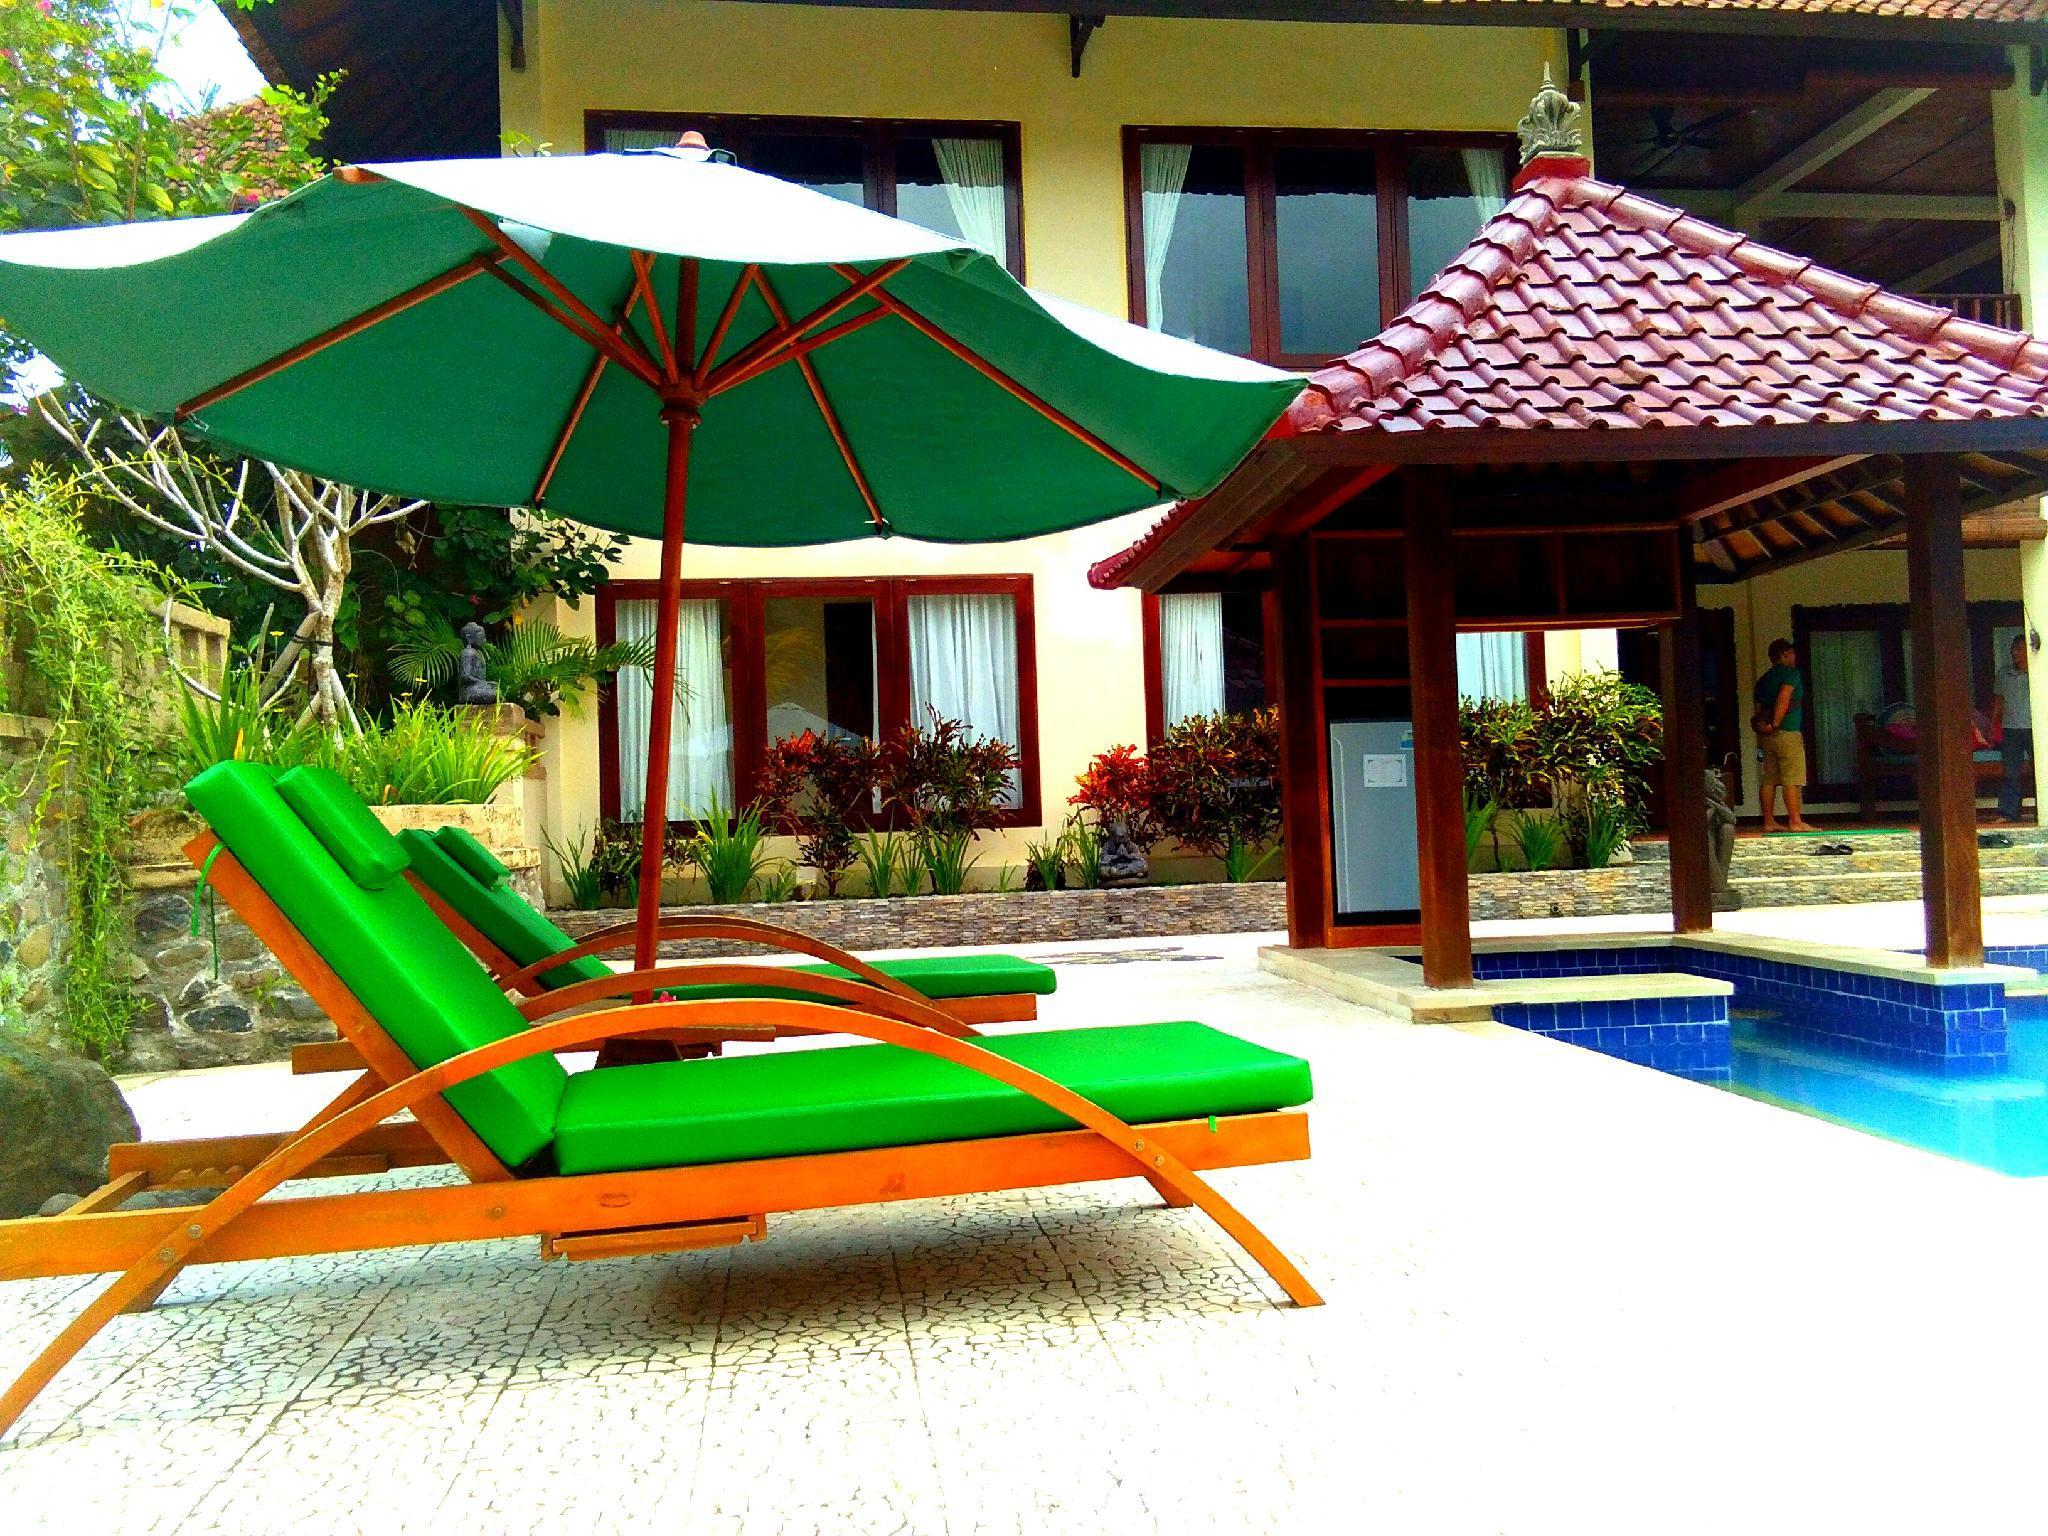 9 Bedroom The Jembrana Home Villa At West Bali